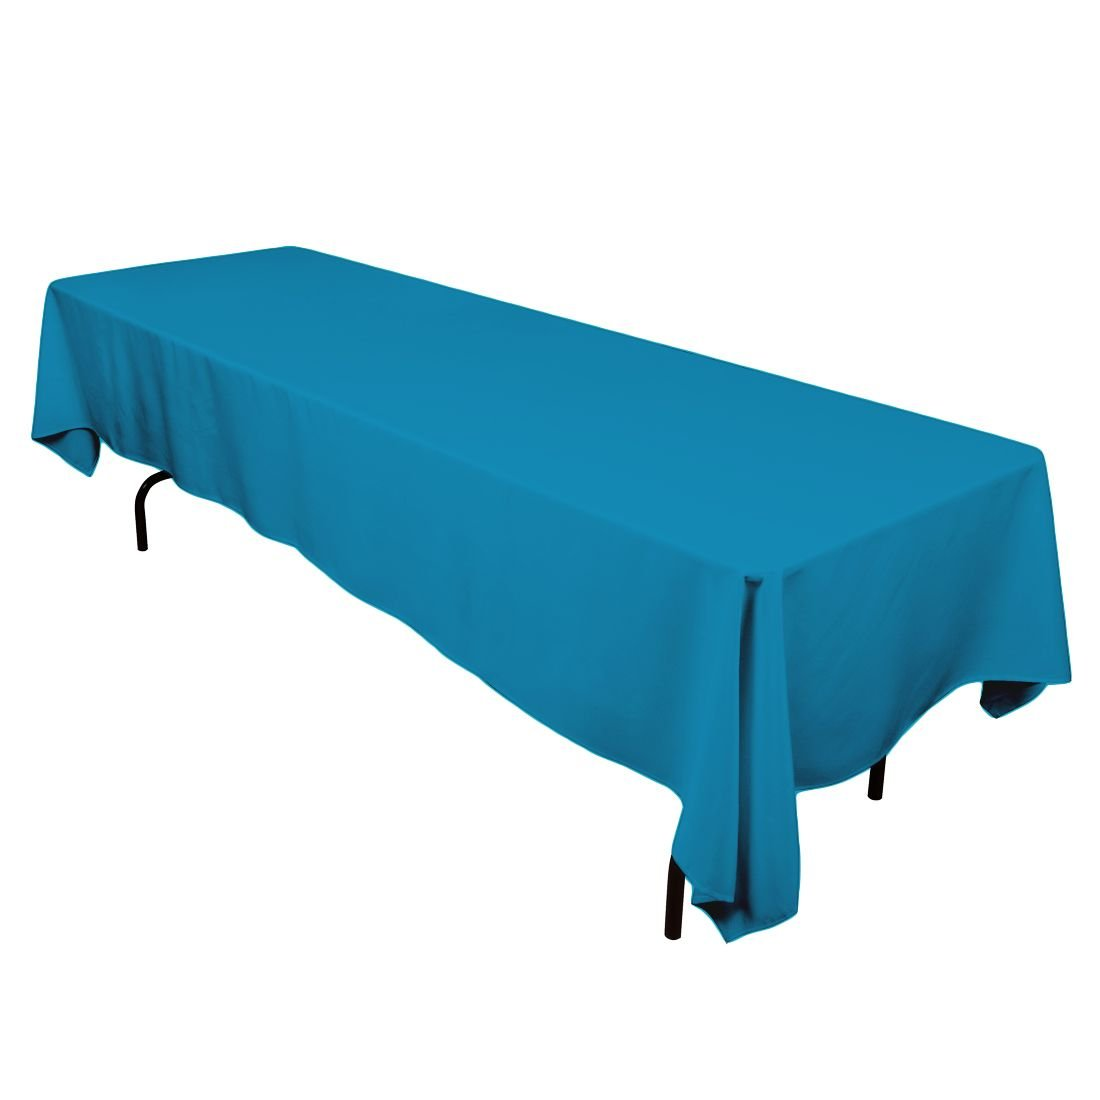 LinenTablecloth 60 x 126-Inch Rectangular Polyester Tablecloth Caribbean